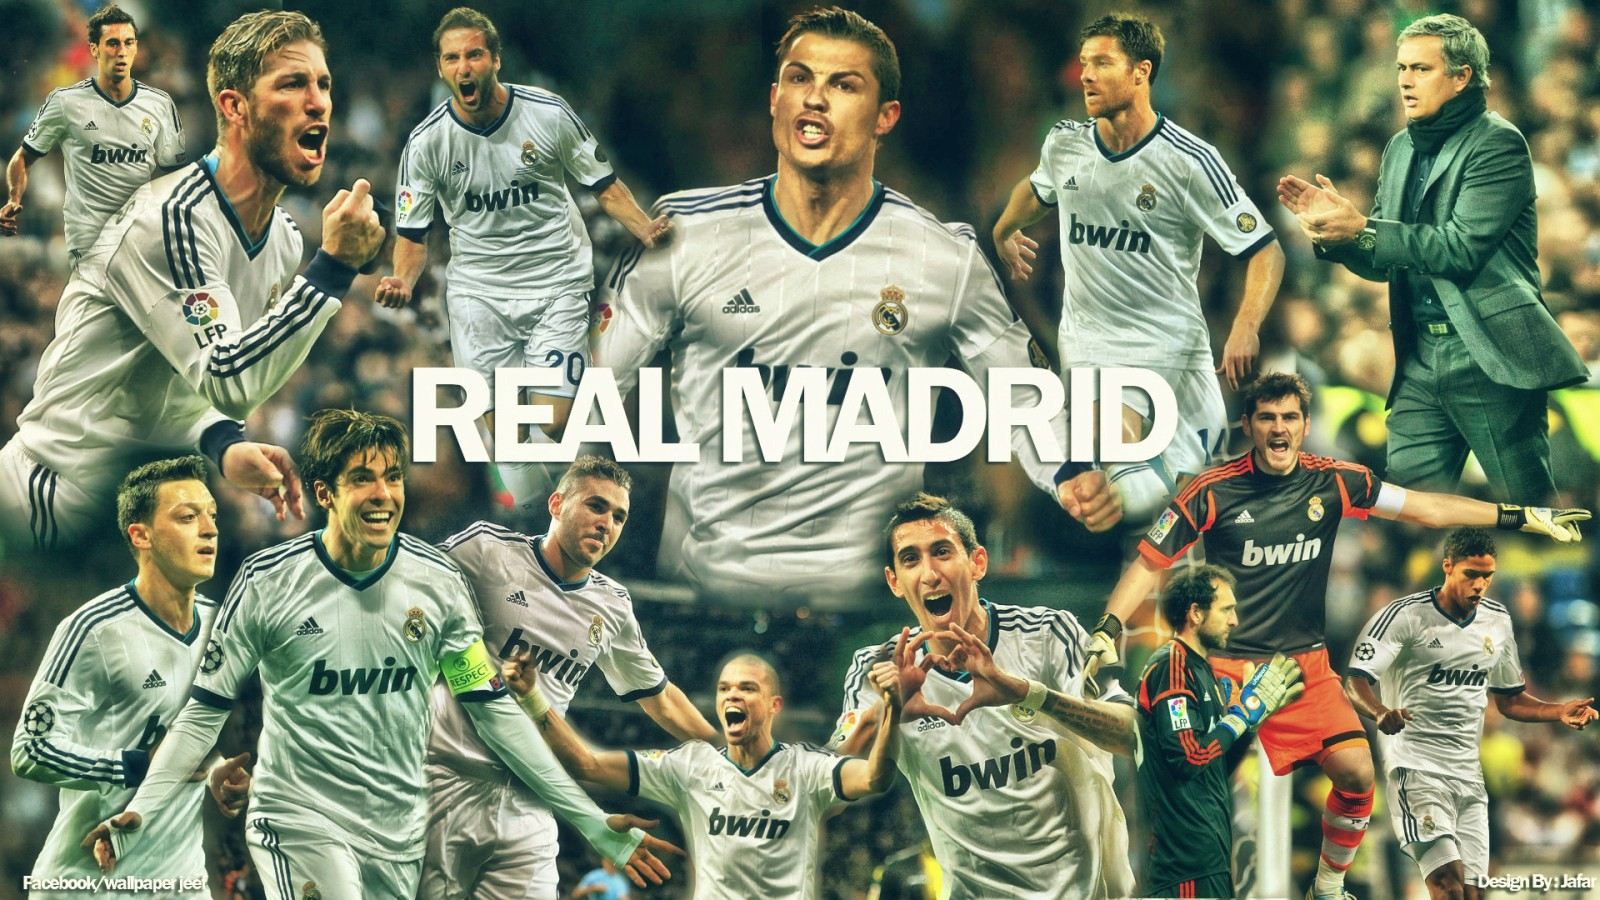 Real Madrid Squad Wallpaper Hd